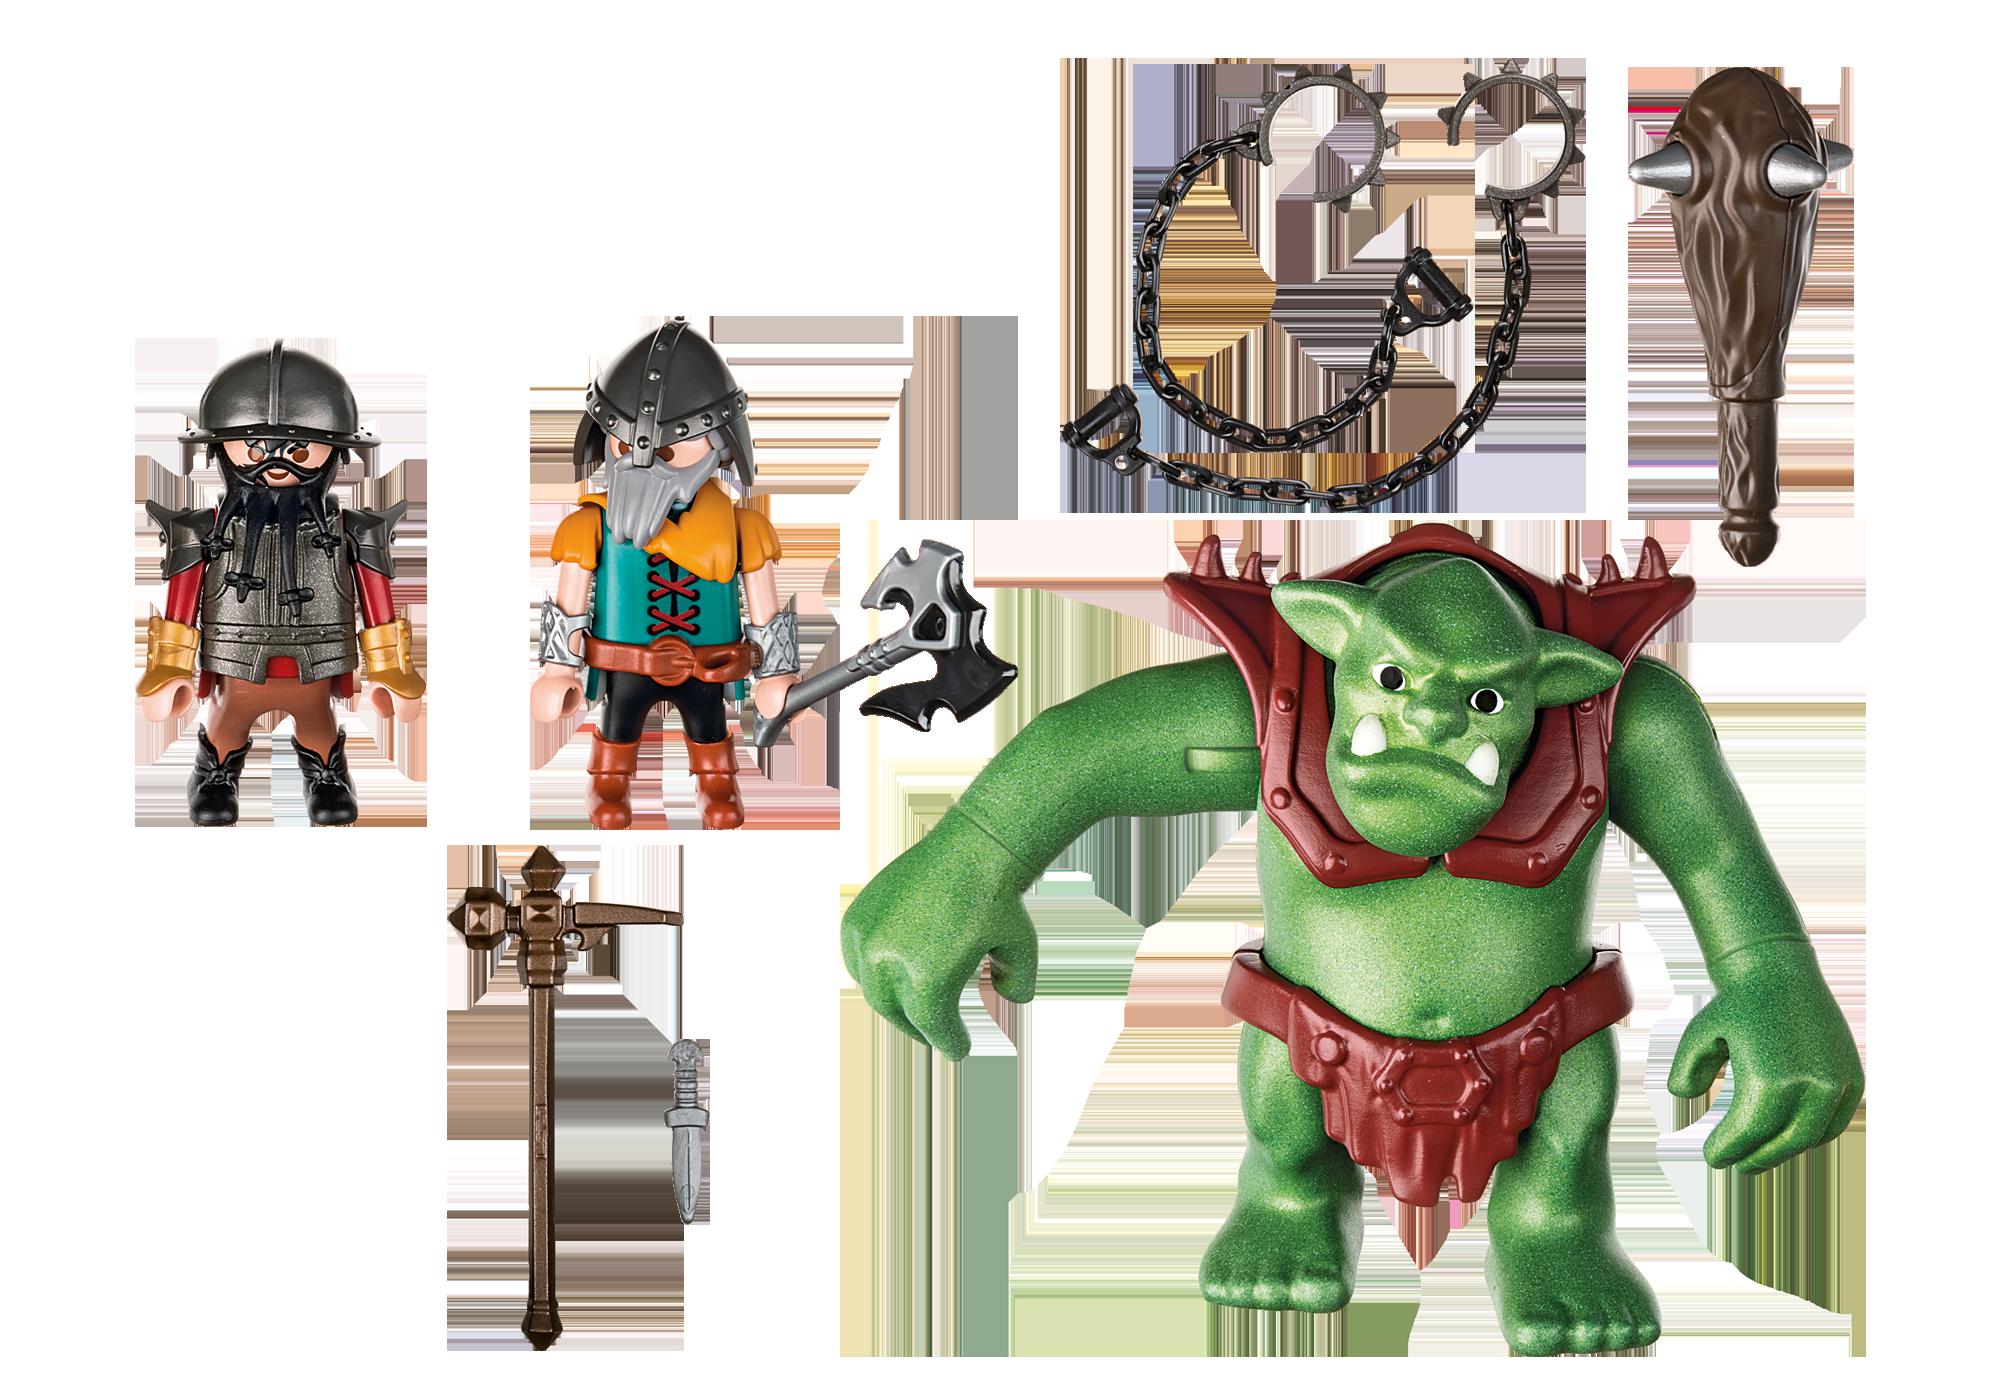 http://media.playmobil.com/i/playmobil/6004_product_box_back/Рыцари: Гигантский троль и боевые гномы